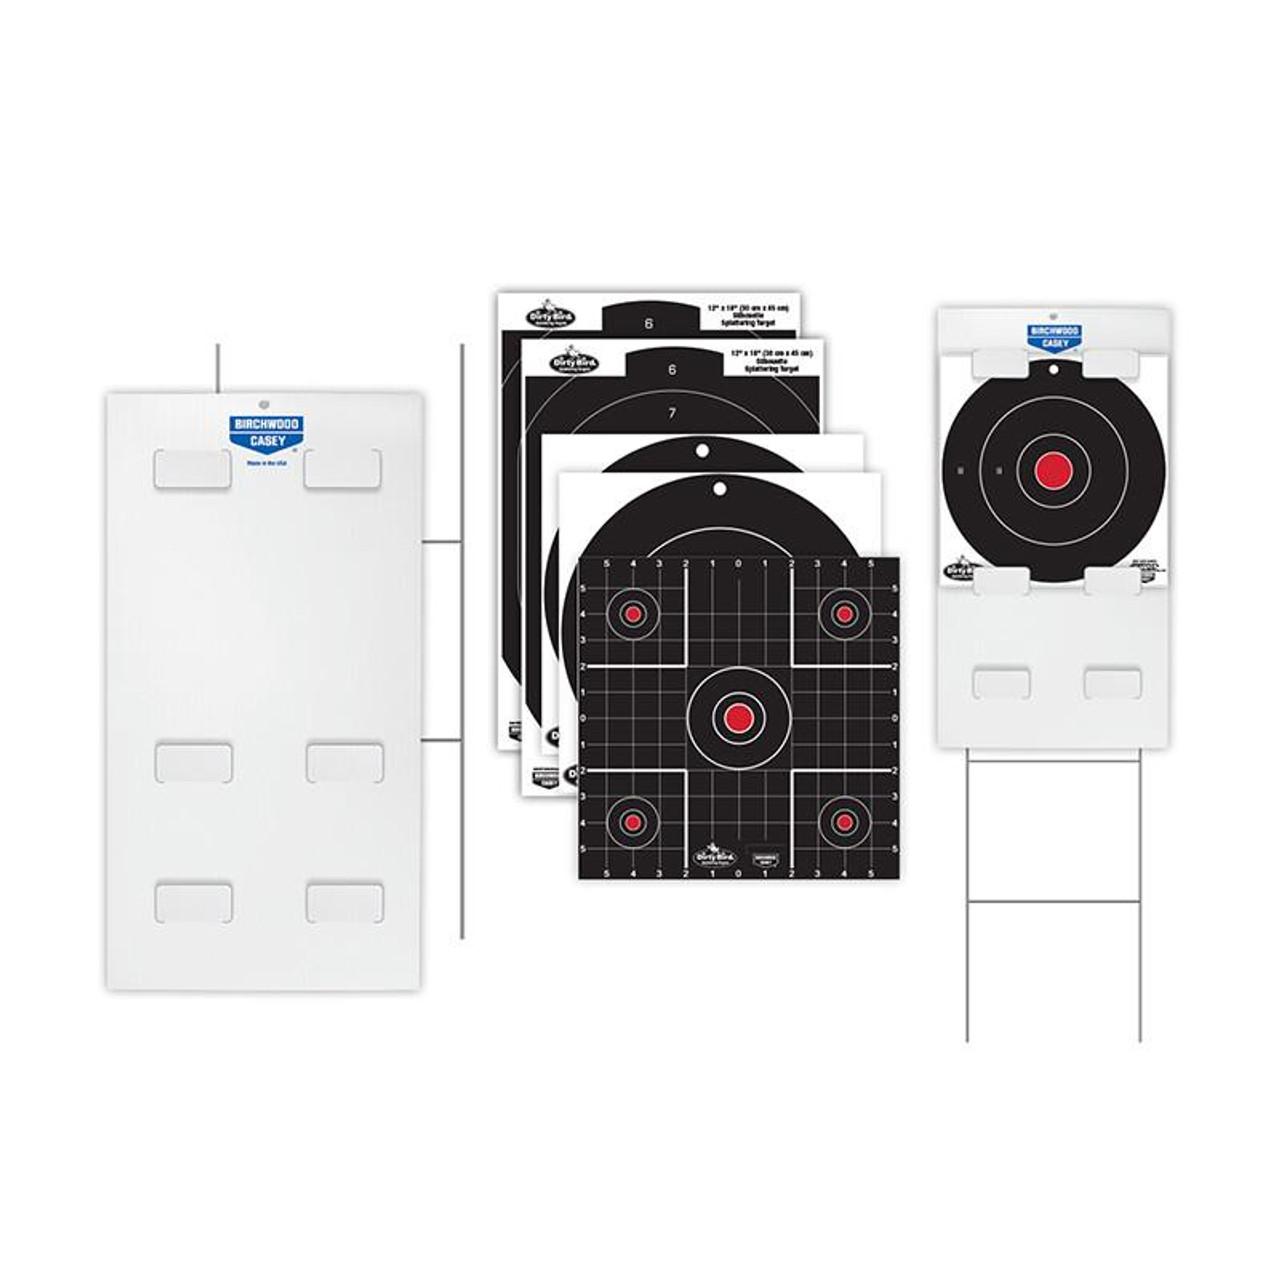 Sharpshooter™ TabLock Dirty Bird® Target Kits